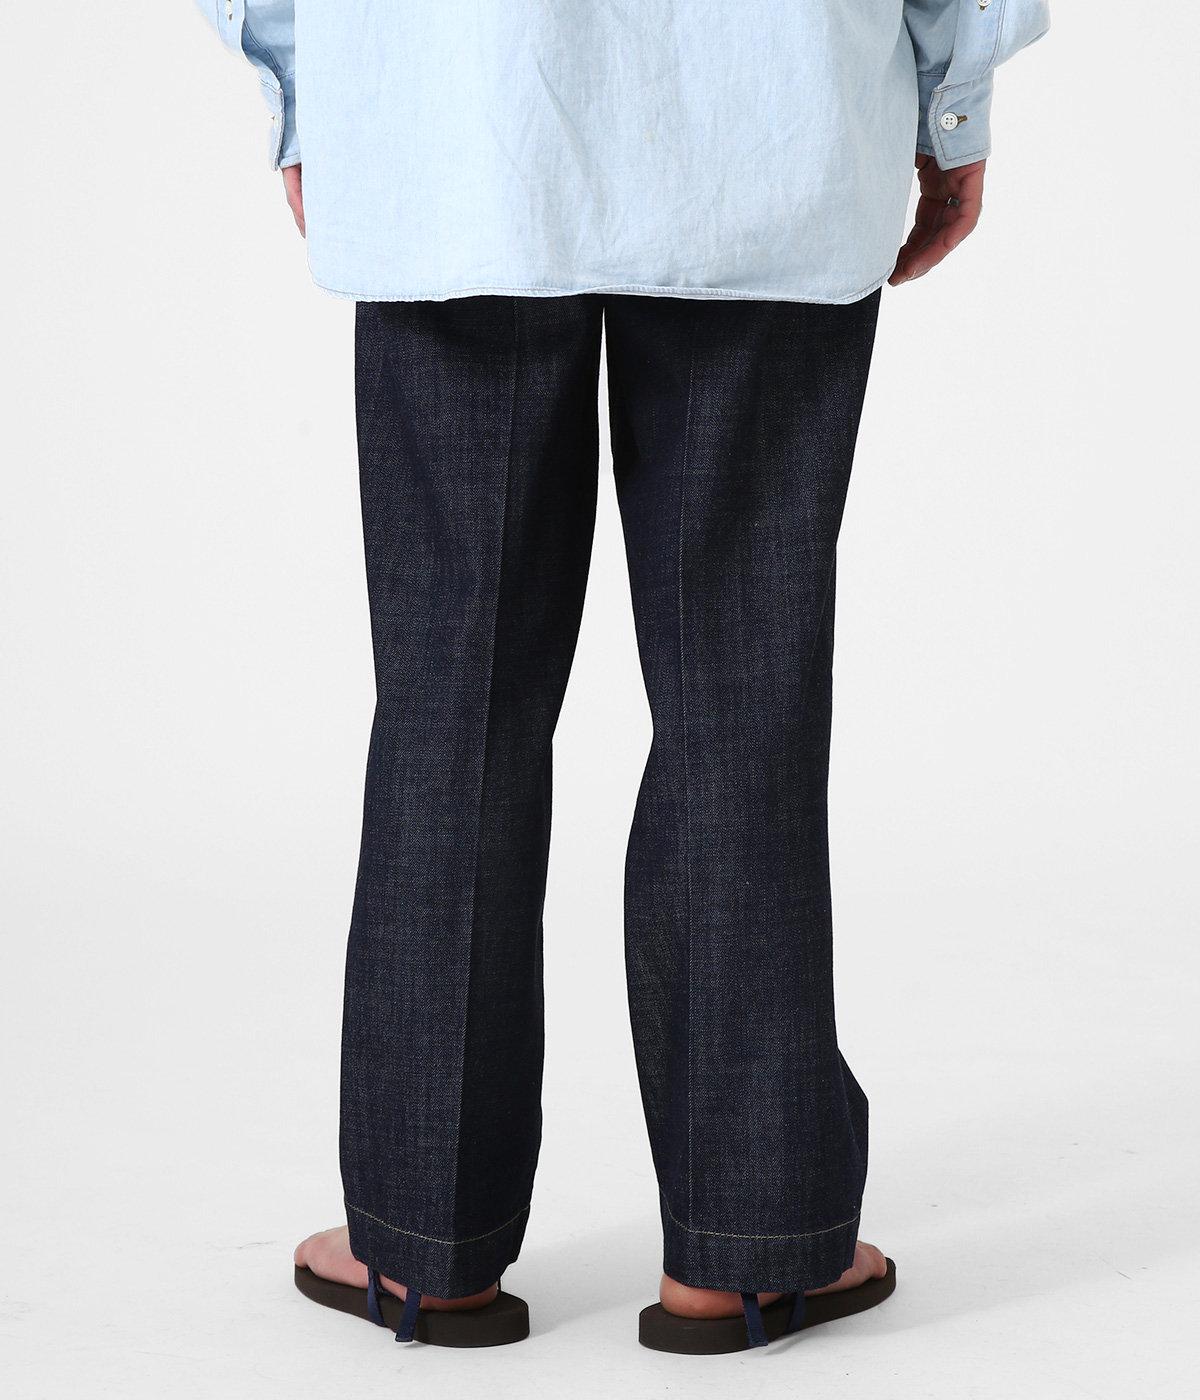 1TUCK JEANS - 10oz organic cotton denim -